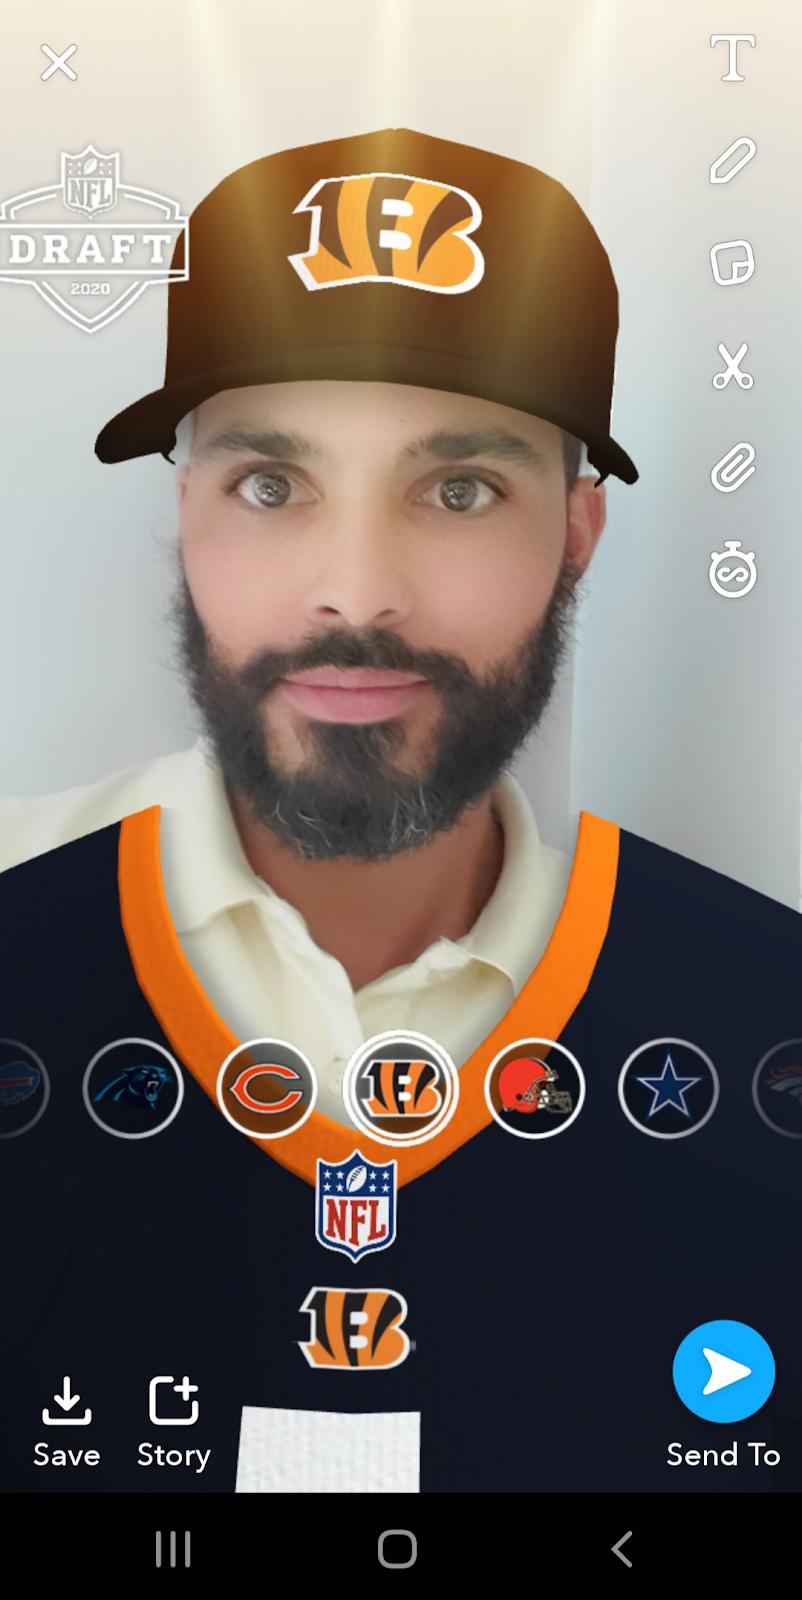 Snapchat lenses for Snapchat advertising.